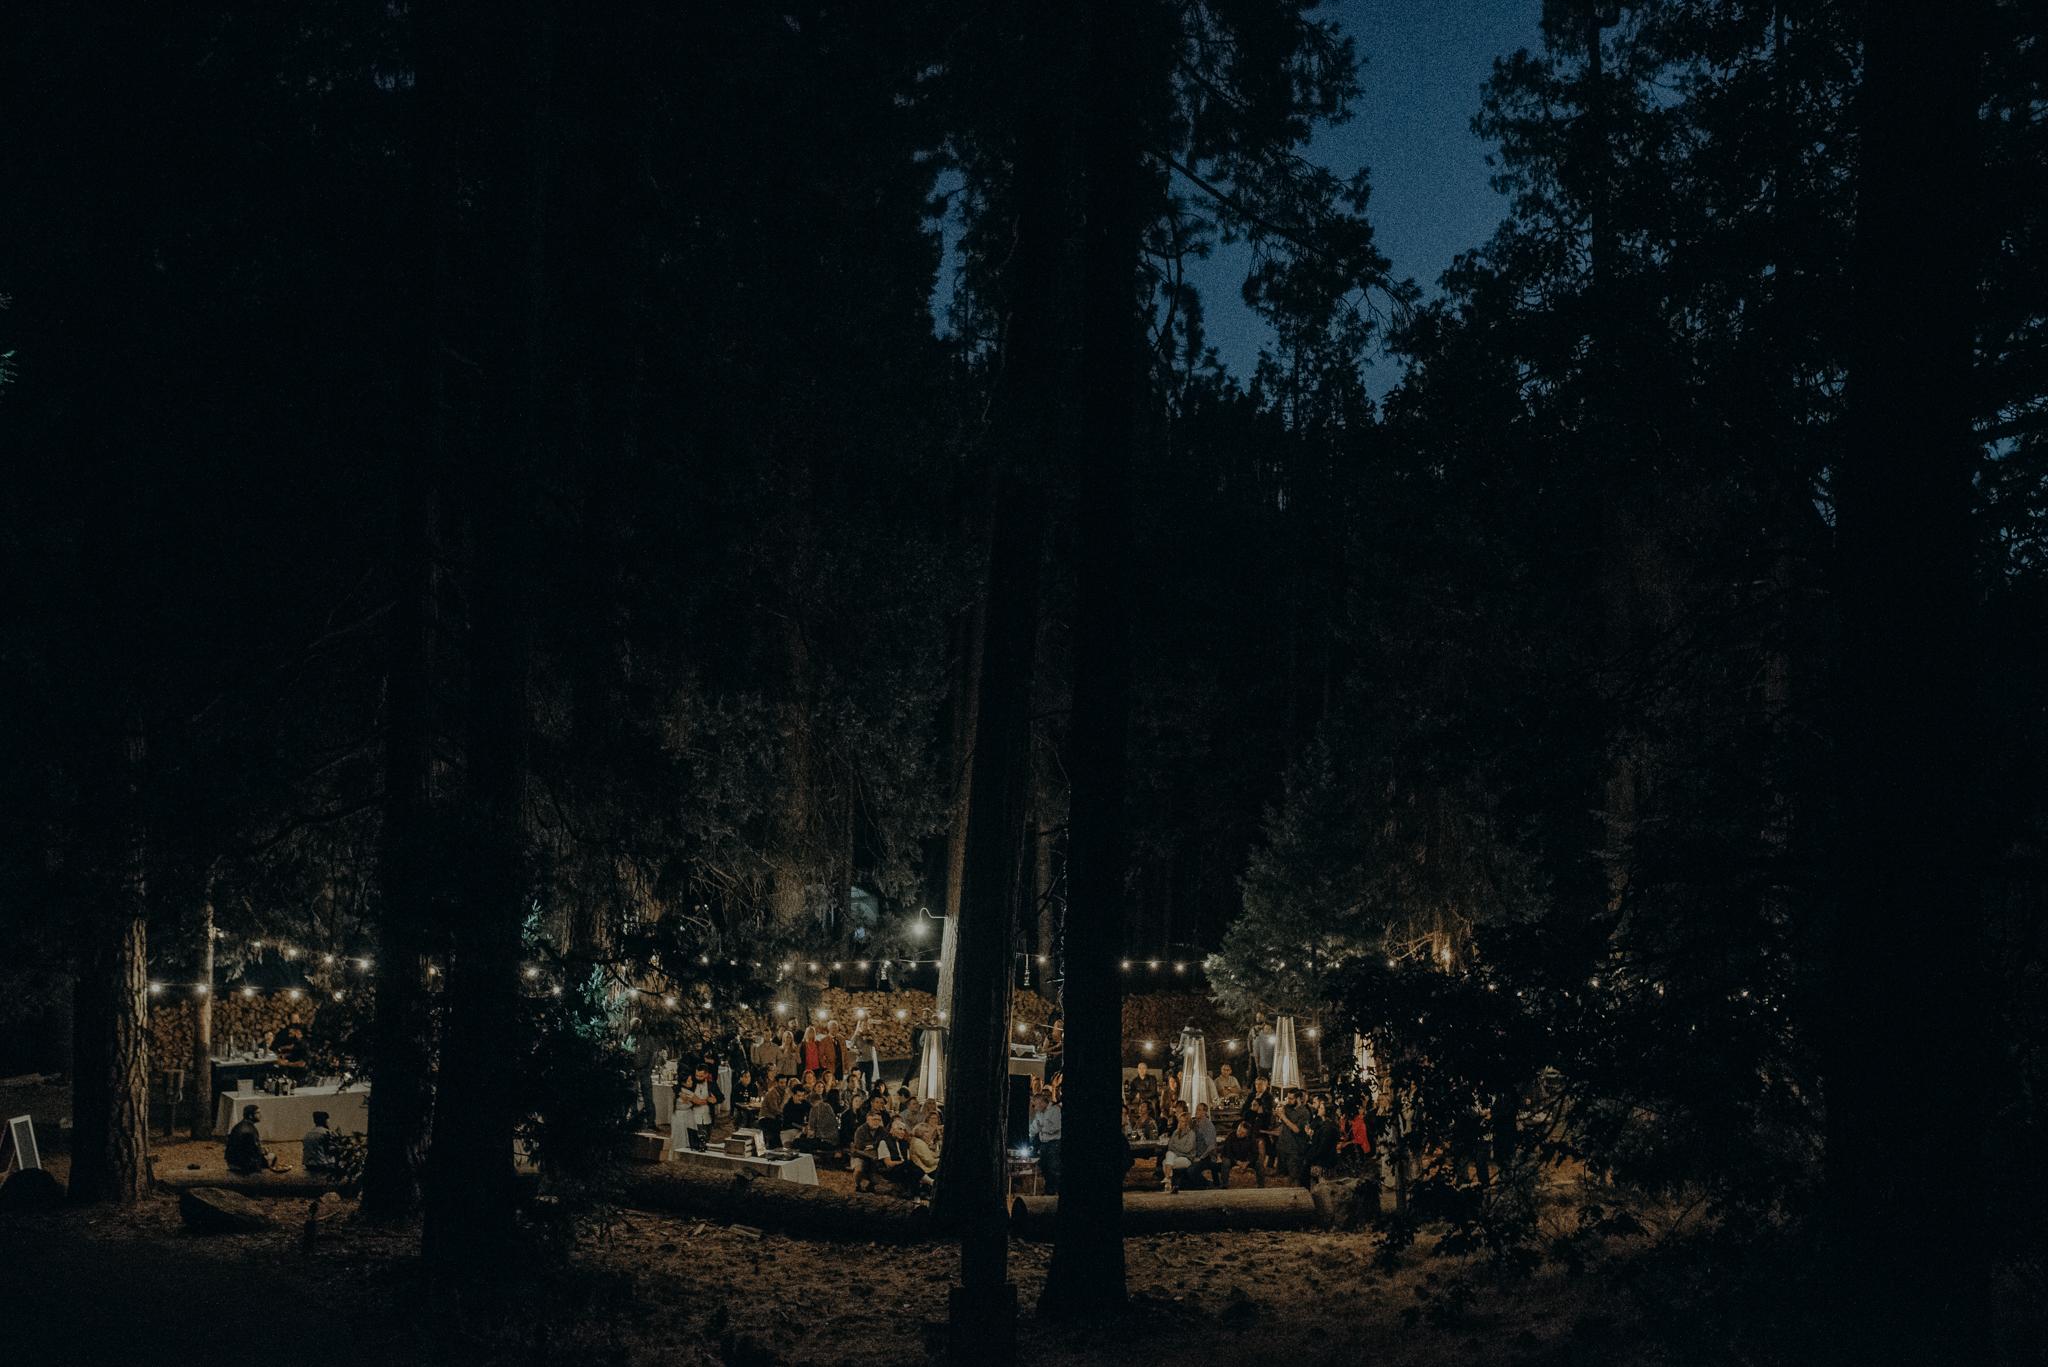 Yosemite Elopement Photographer - Evergreen Lodge Wedding Photographer - IsaiahAndTaylor.com-151.jpg